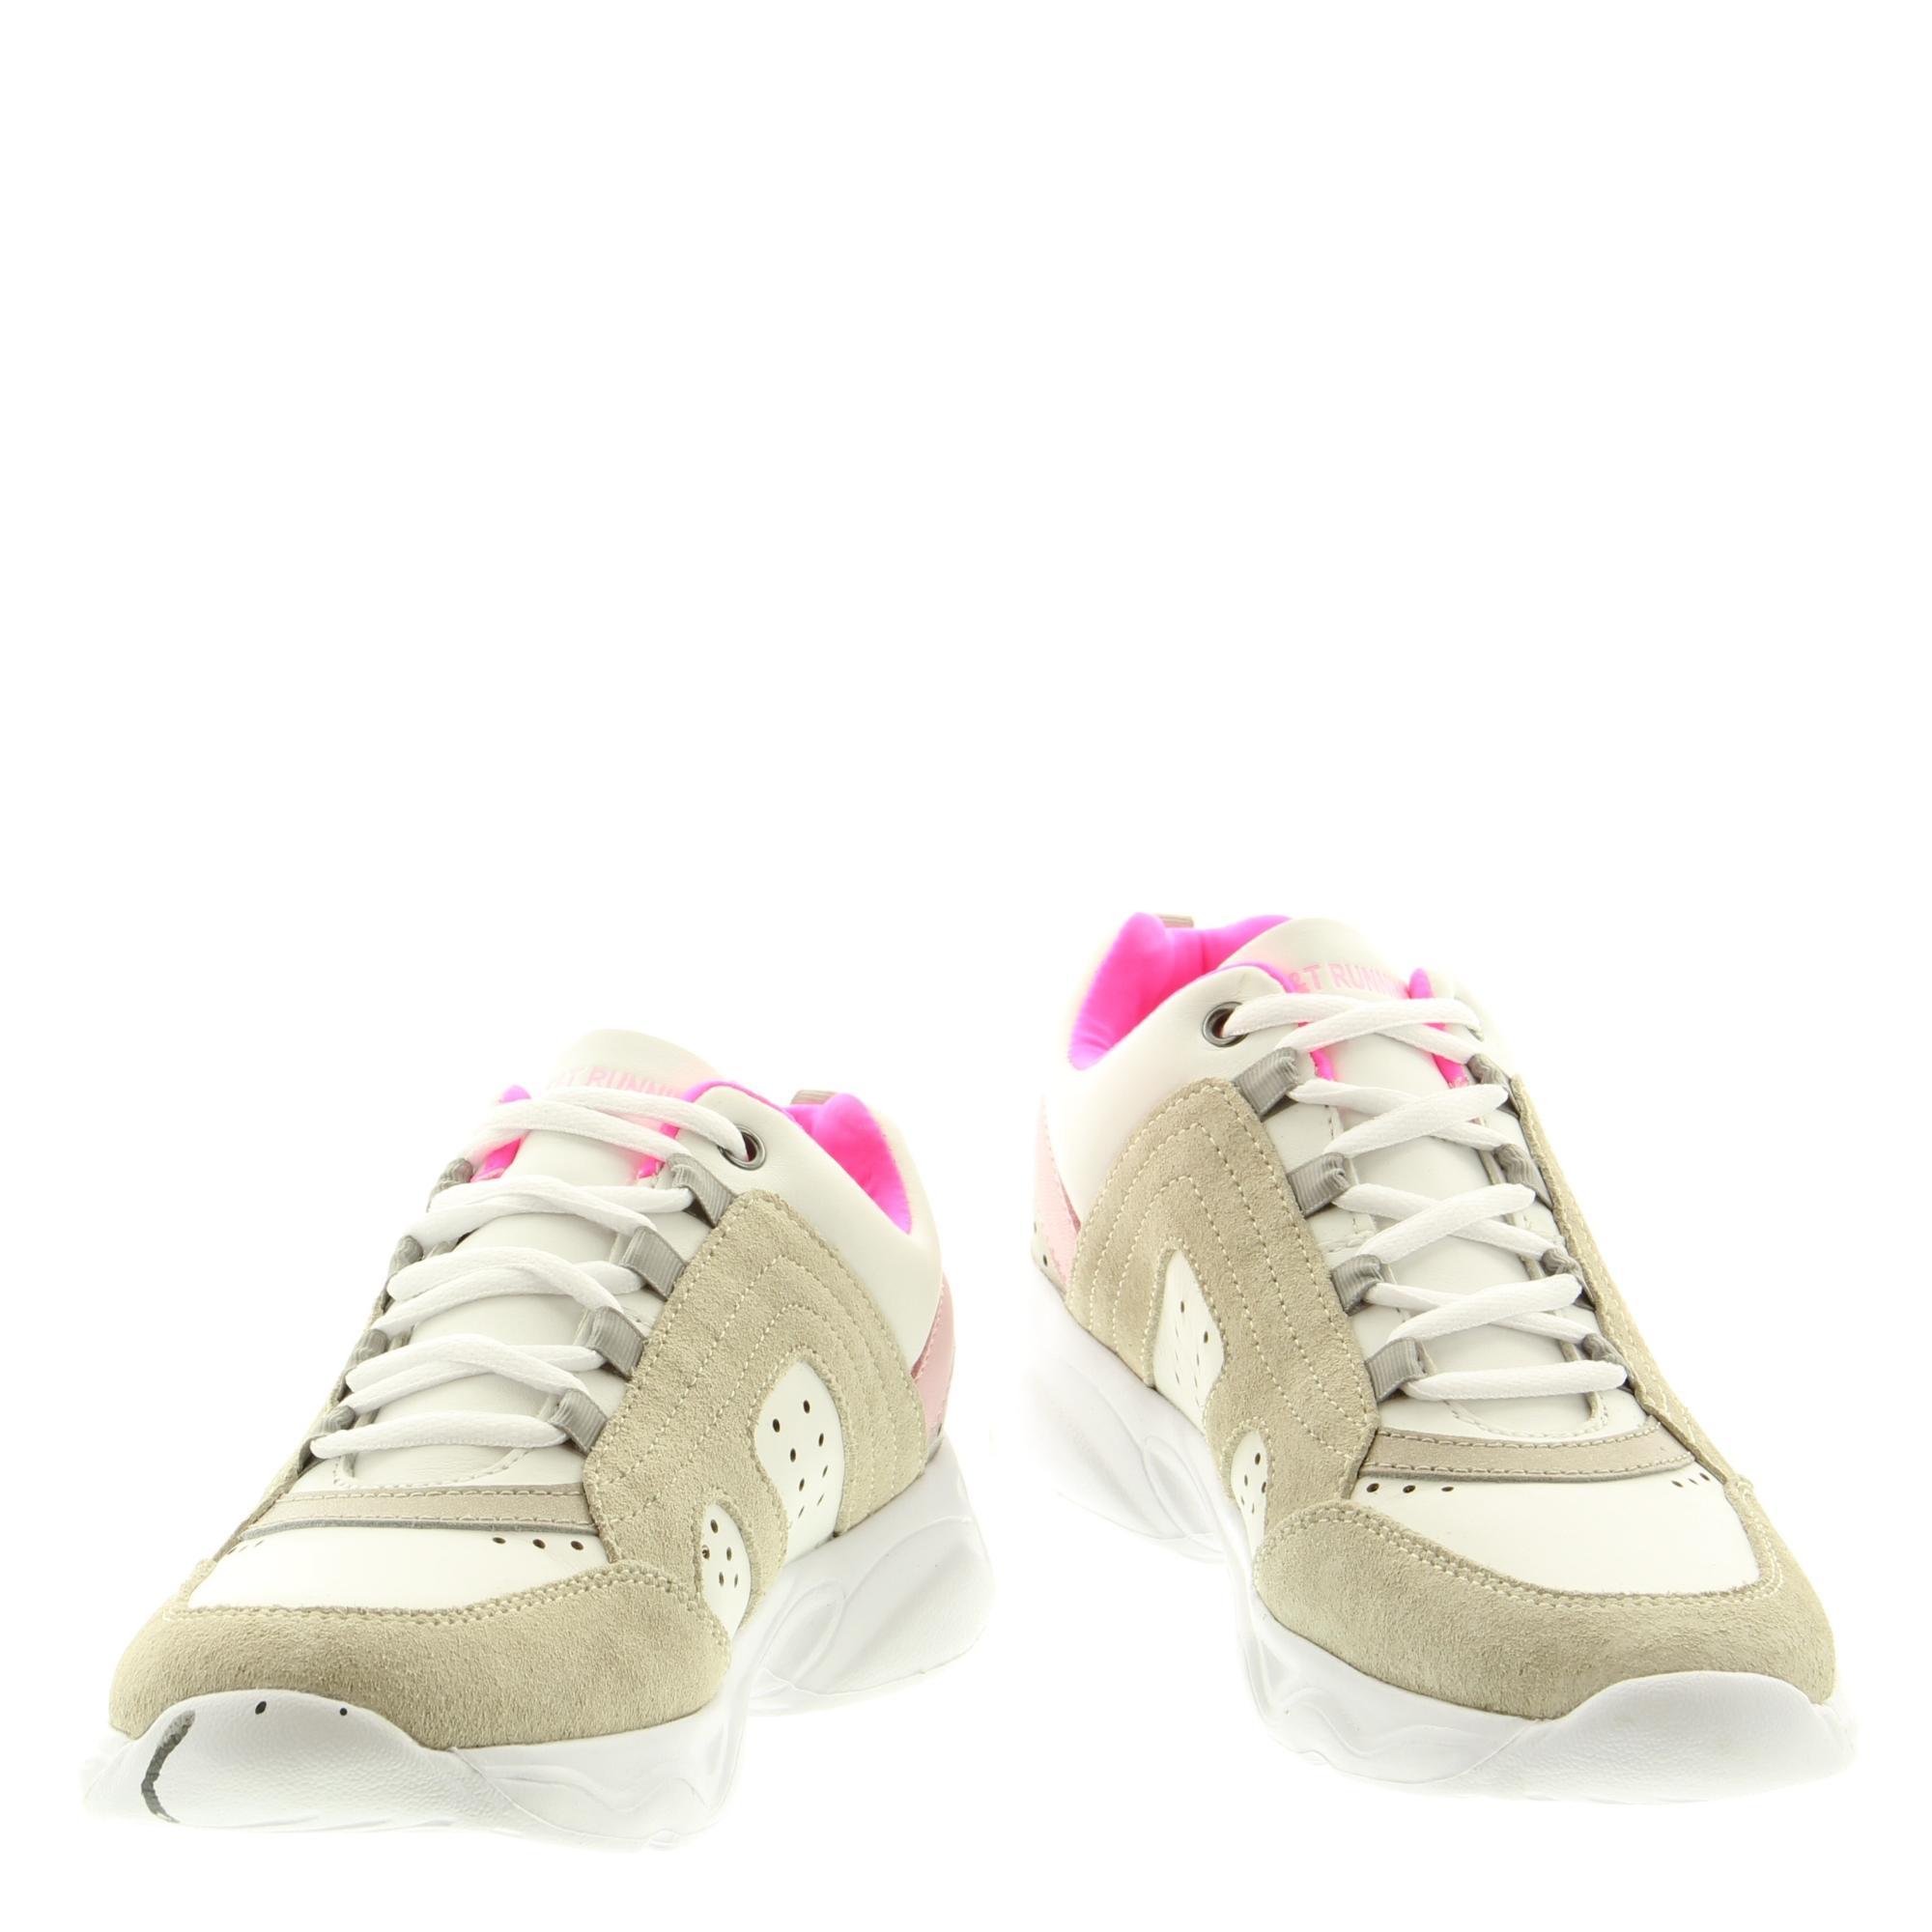 Twins Trackstyle 320155 400 White Nougat